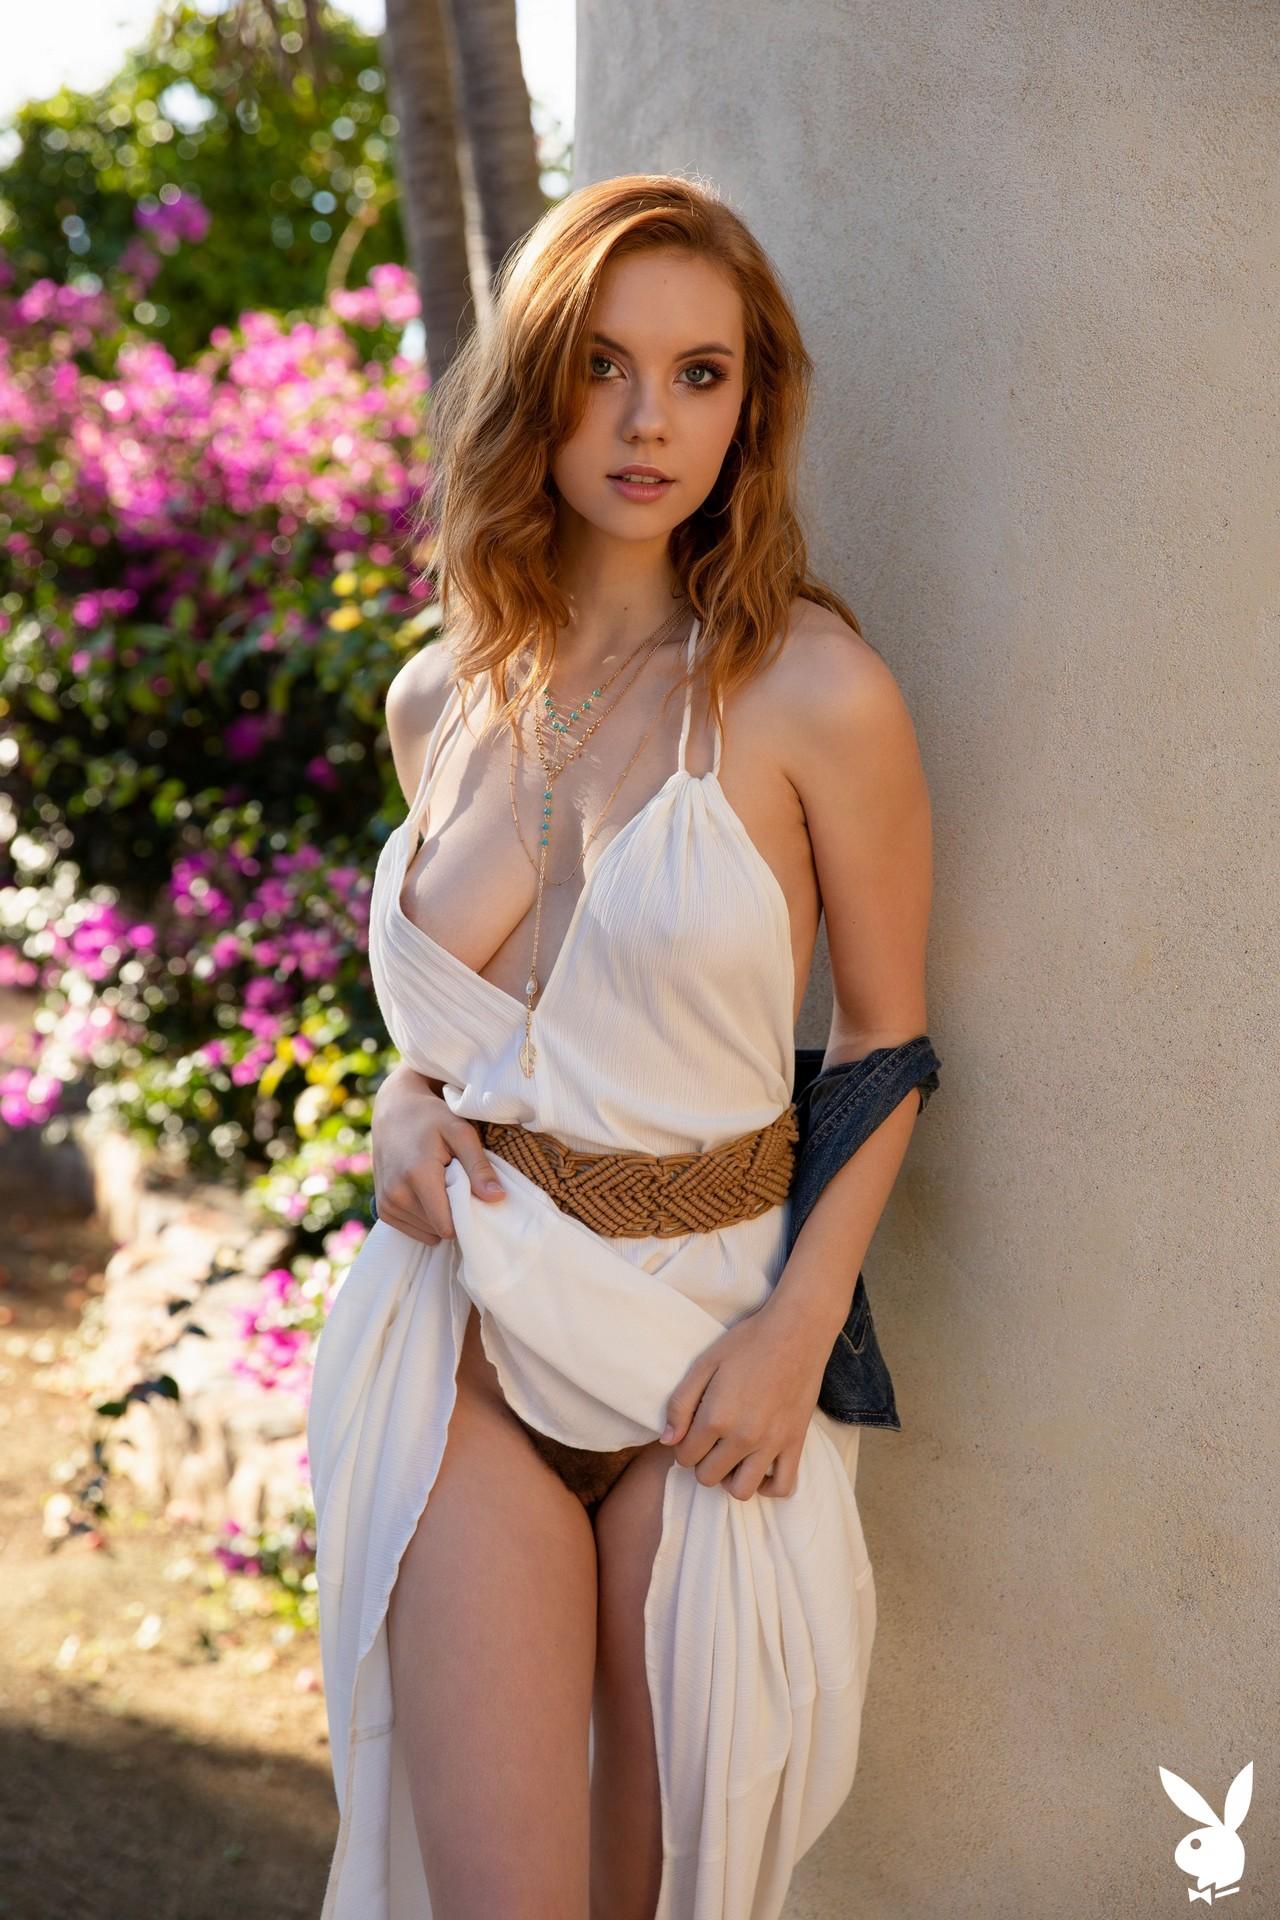 Kayla Coyote In Sundance Playboy Plus (9)